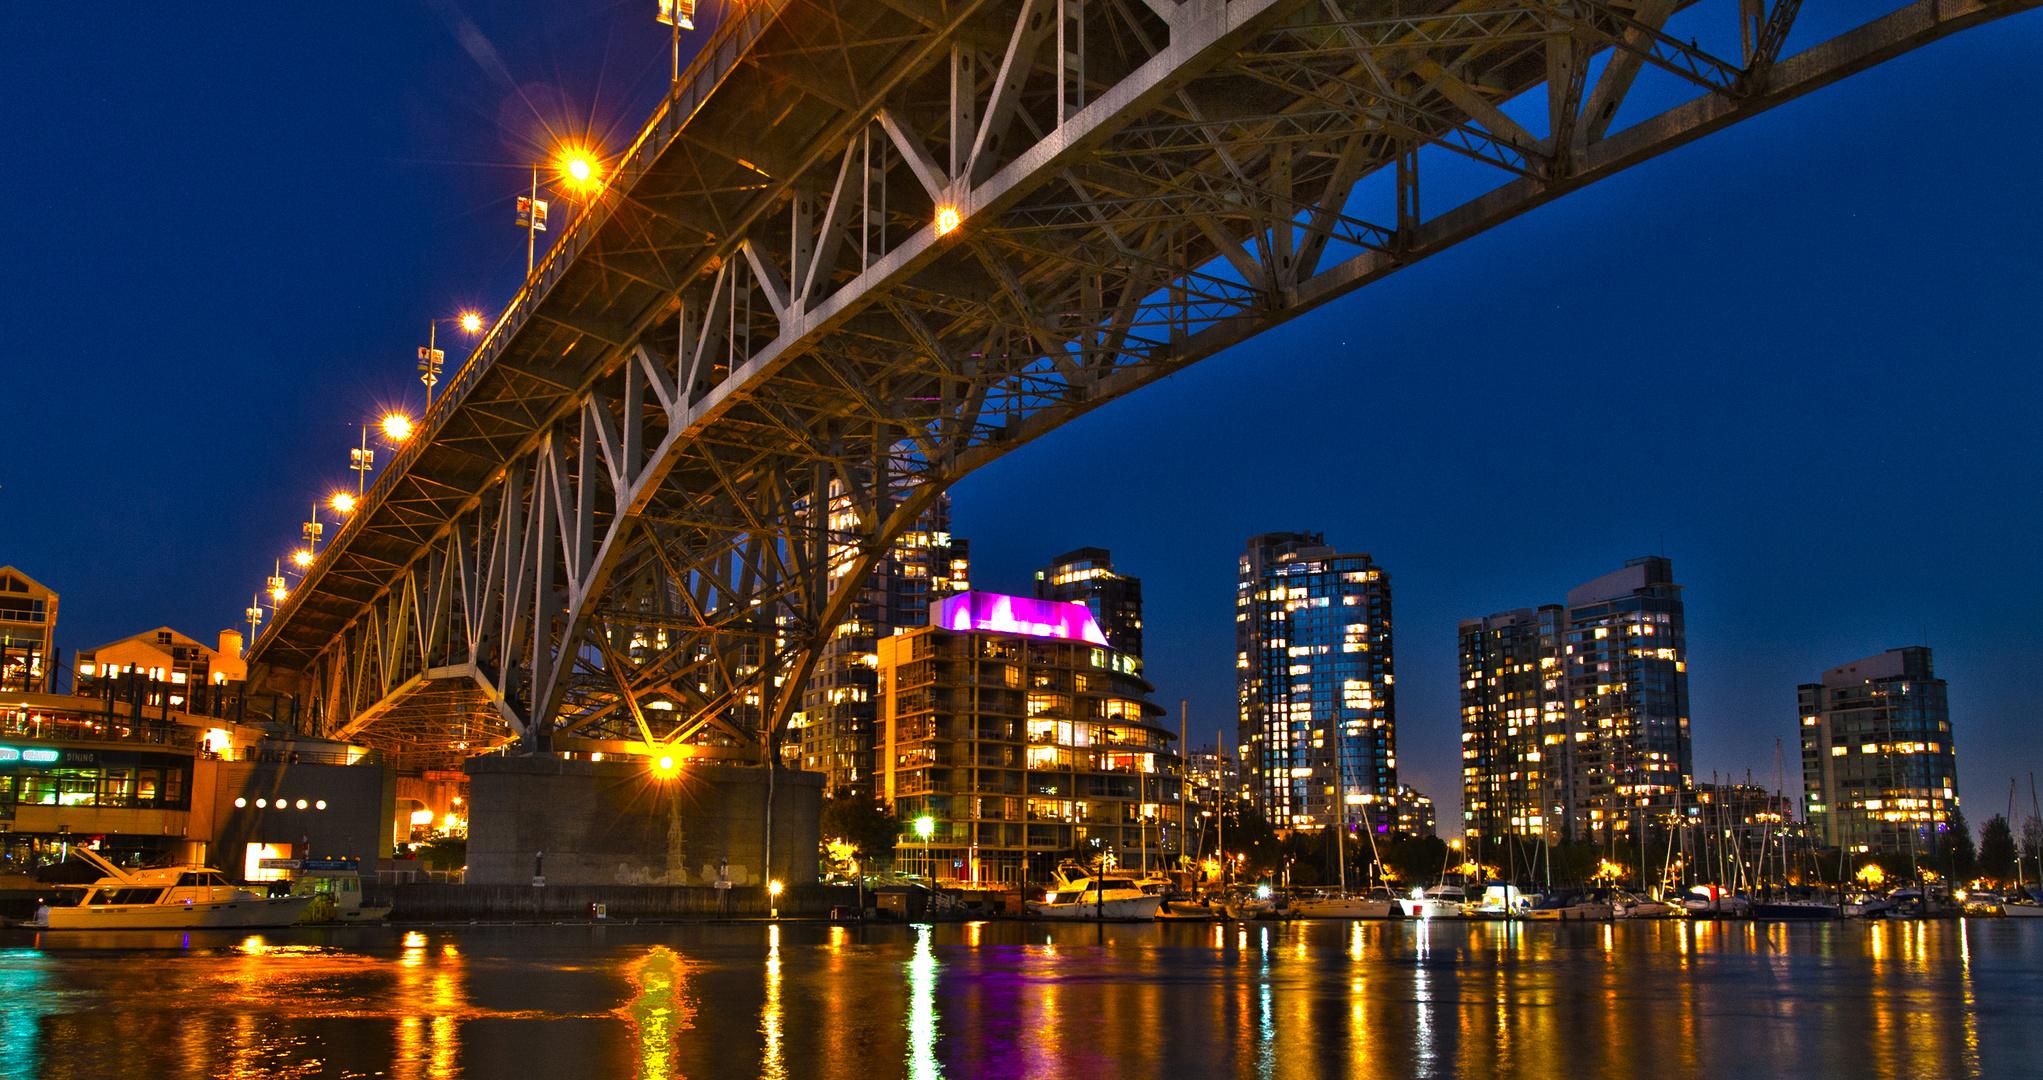 Vancouver Bay - Bridge